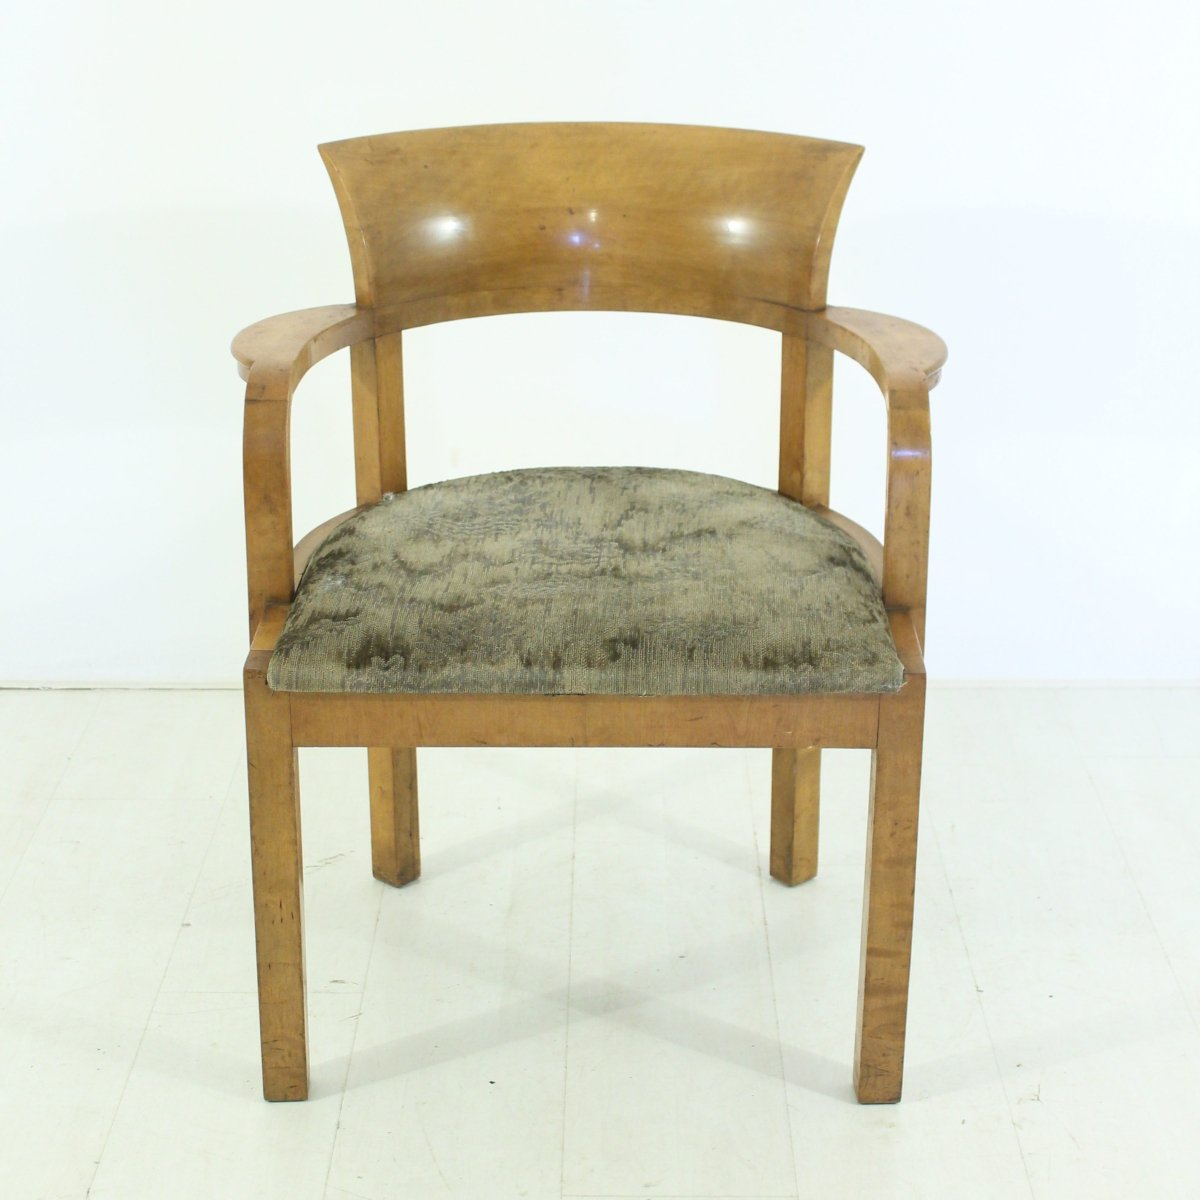 art deco armlehnstuhl aus holz 1930er bei pamono kaufen. Black Bedroom Furniture Sets. Home Design Ideas